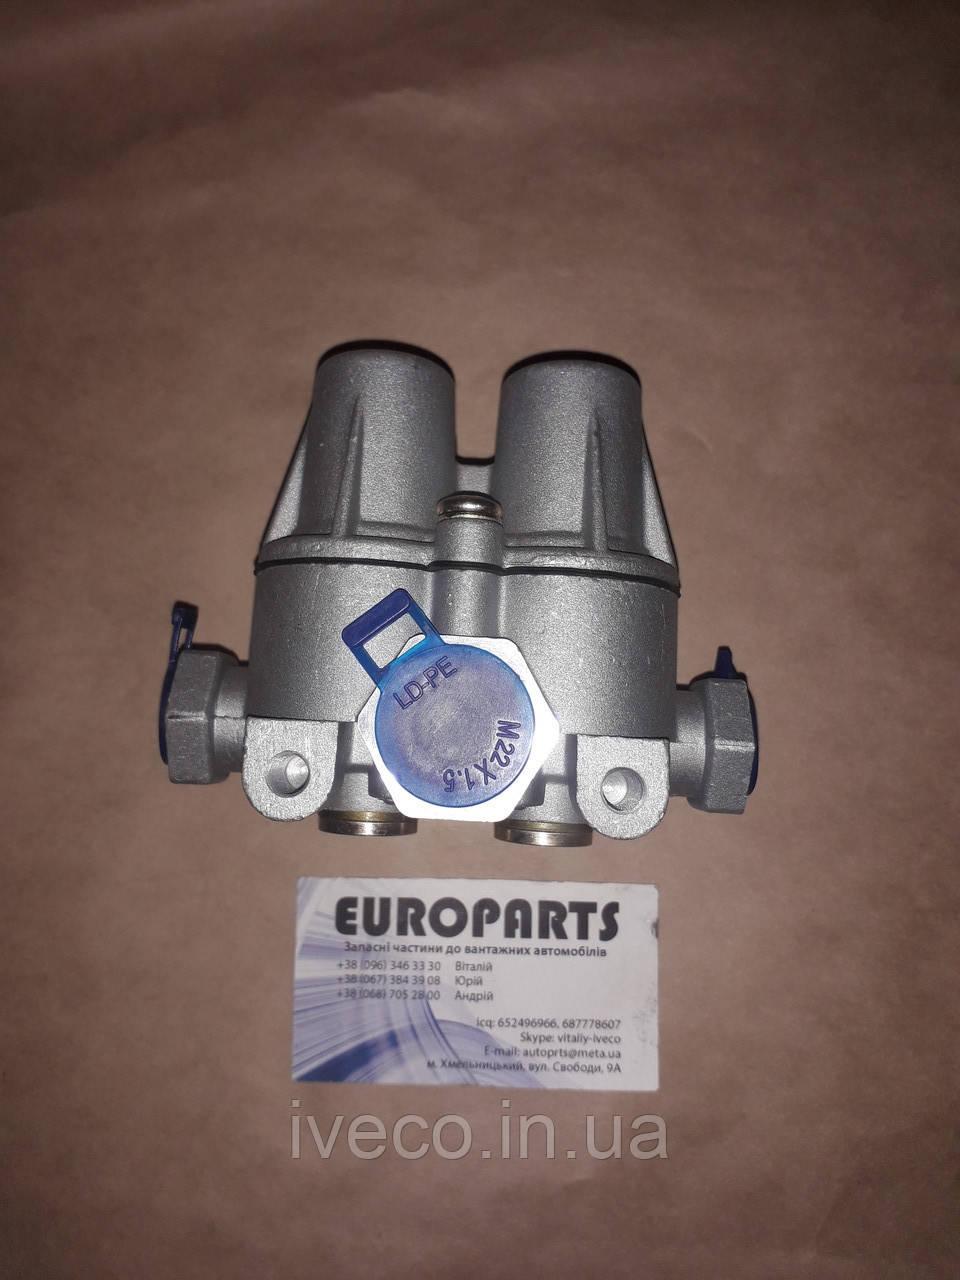 AE4158 AE4612 Кран клапан защитный четырехконтурный Iveco Daf MB RVI 1378560